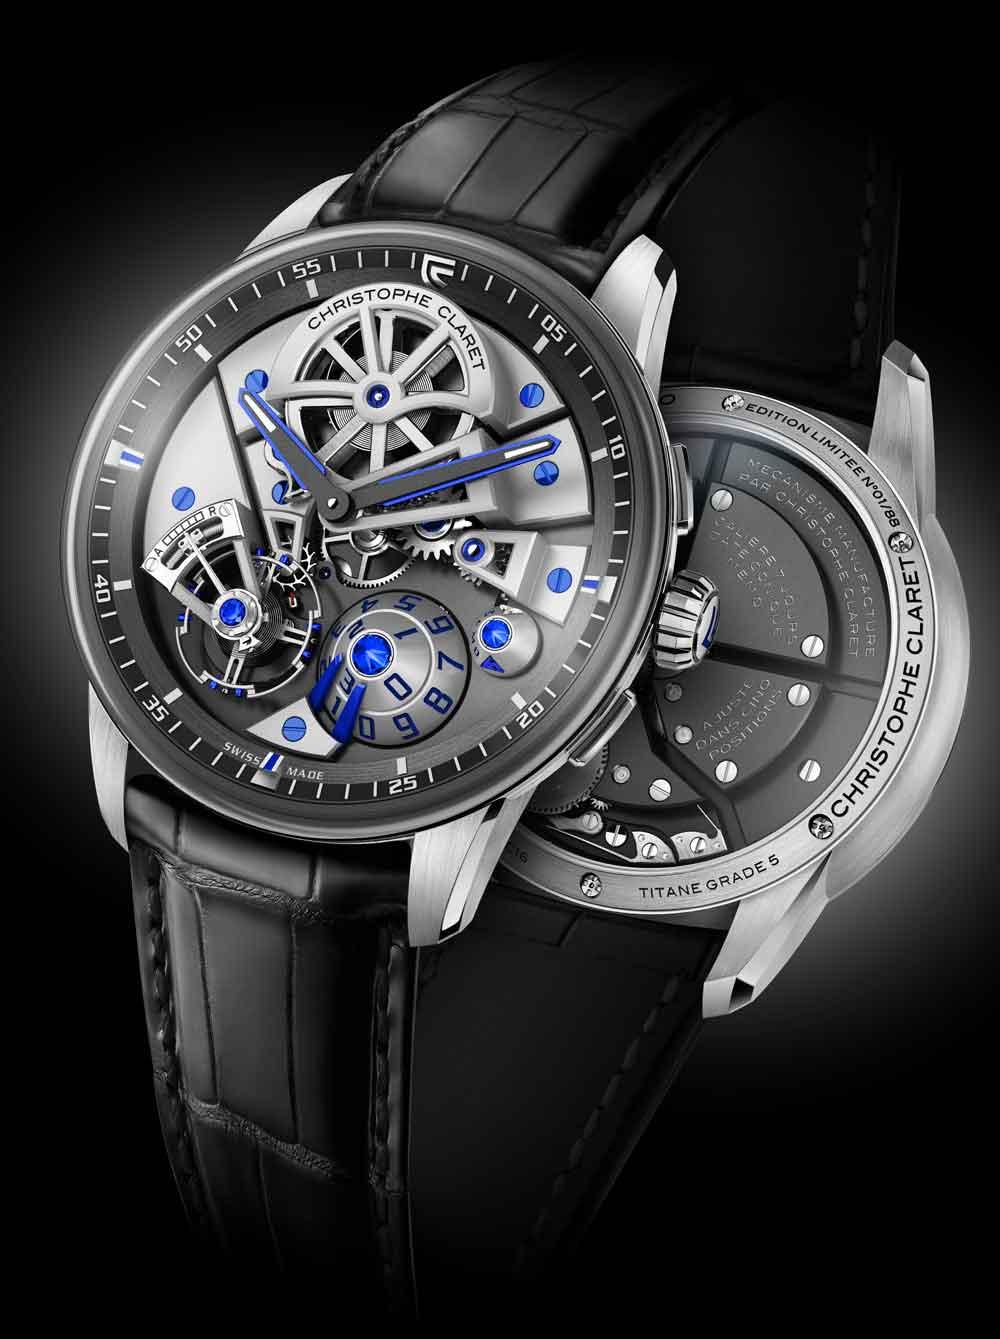 Reloj Christophe Claret Maestro